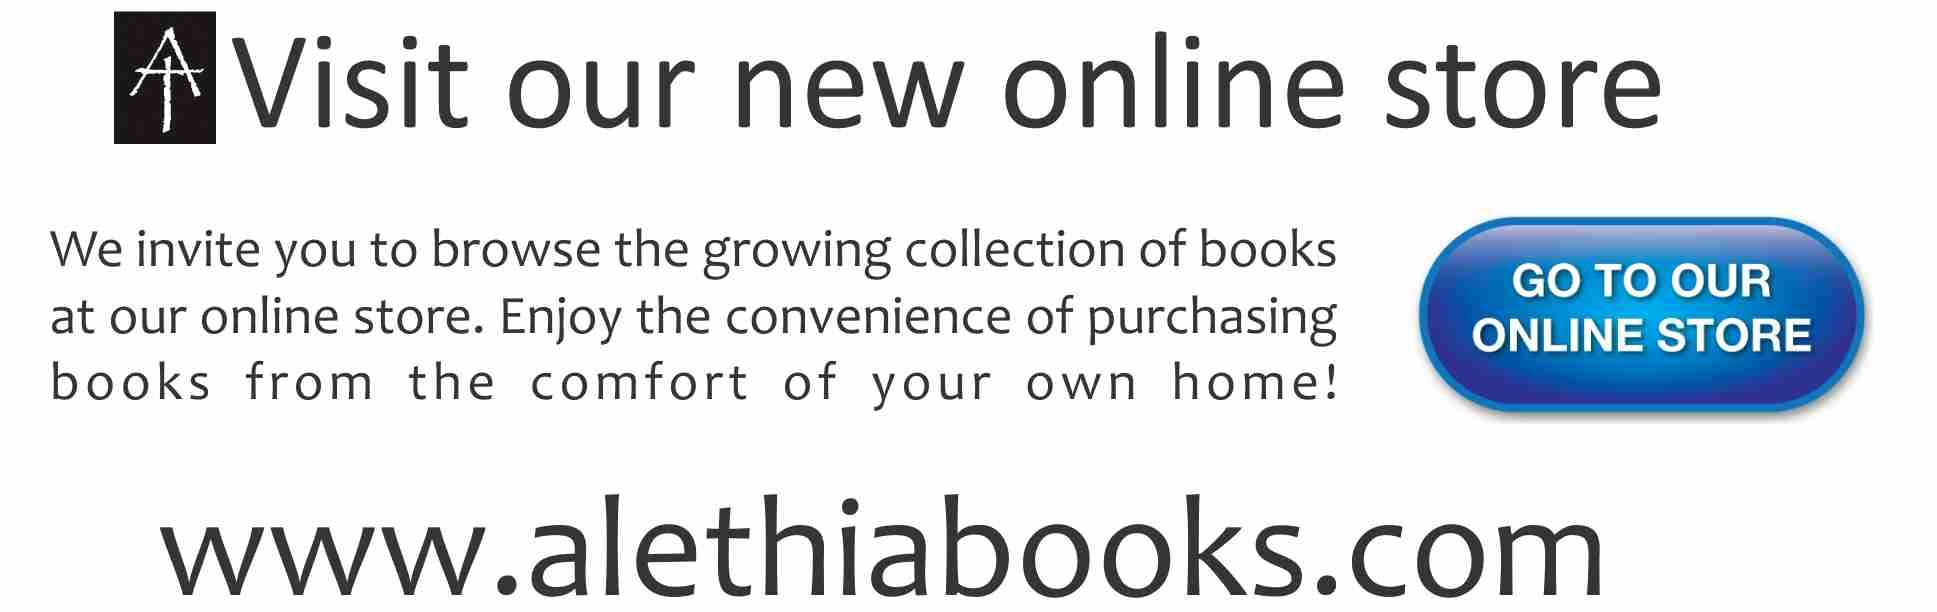 shop-online2